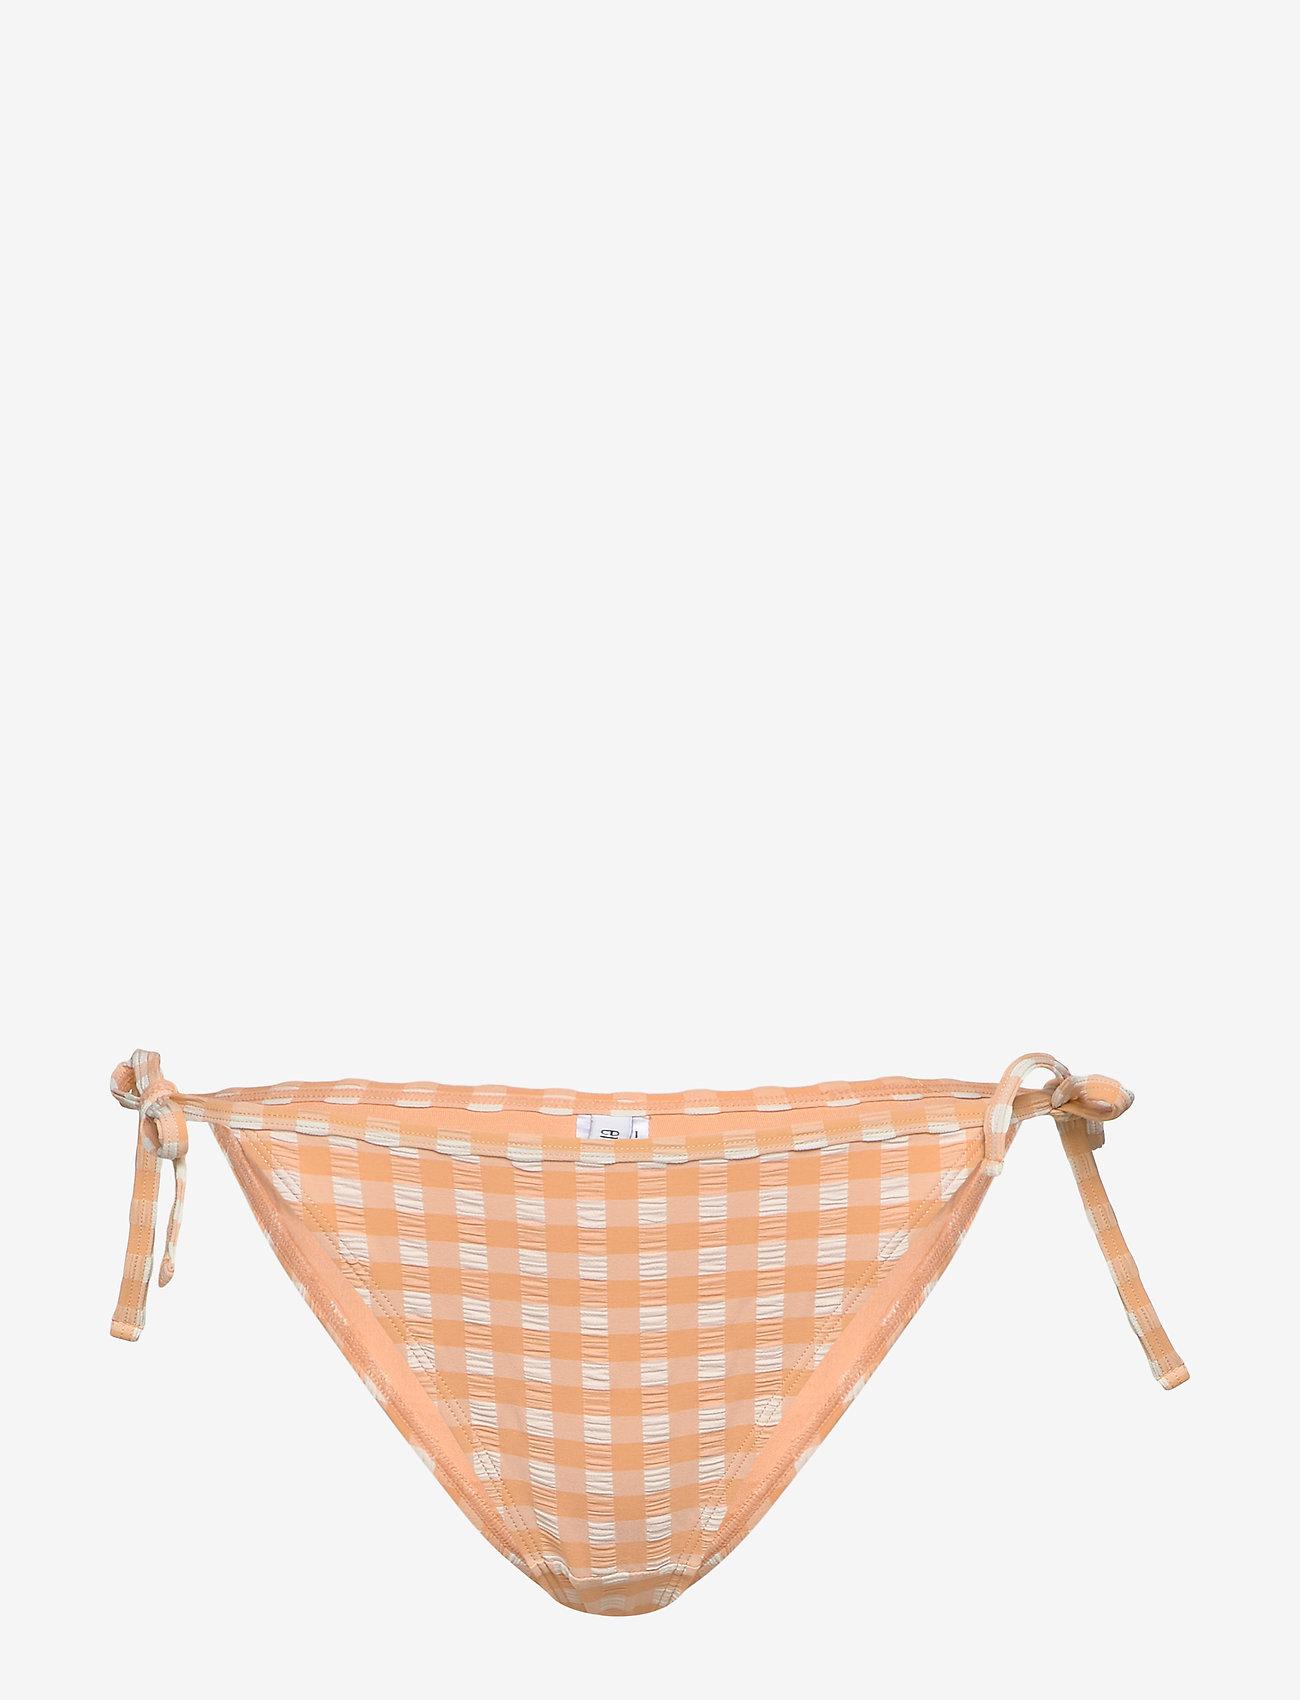 Enhali Swim Panties 5326 (Salmon Check) (195 kr) - Envii